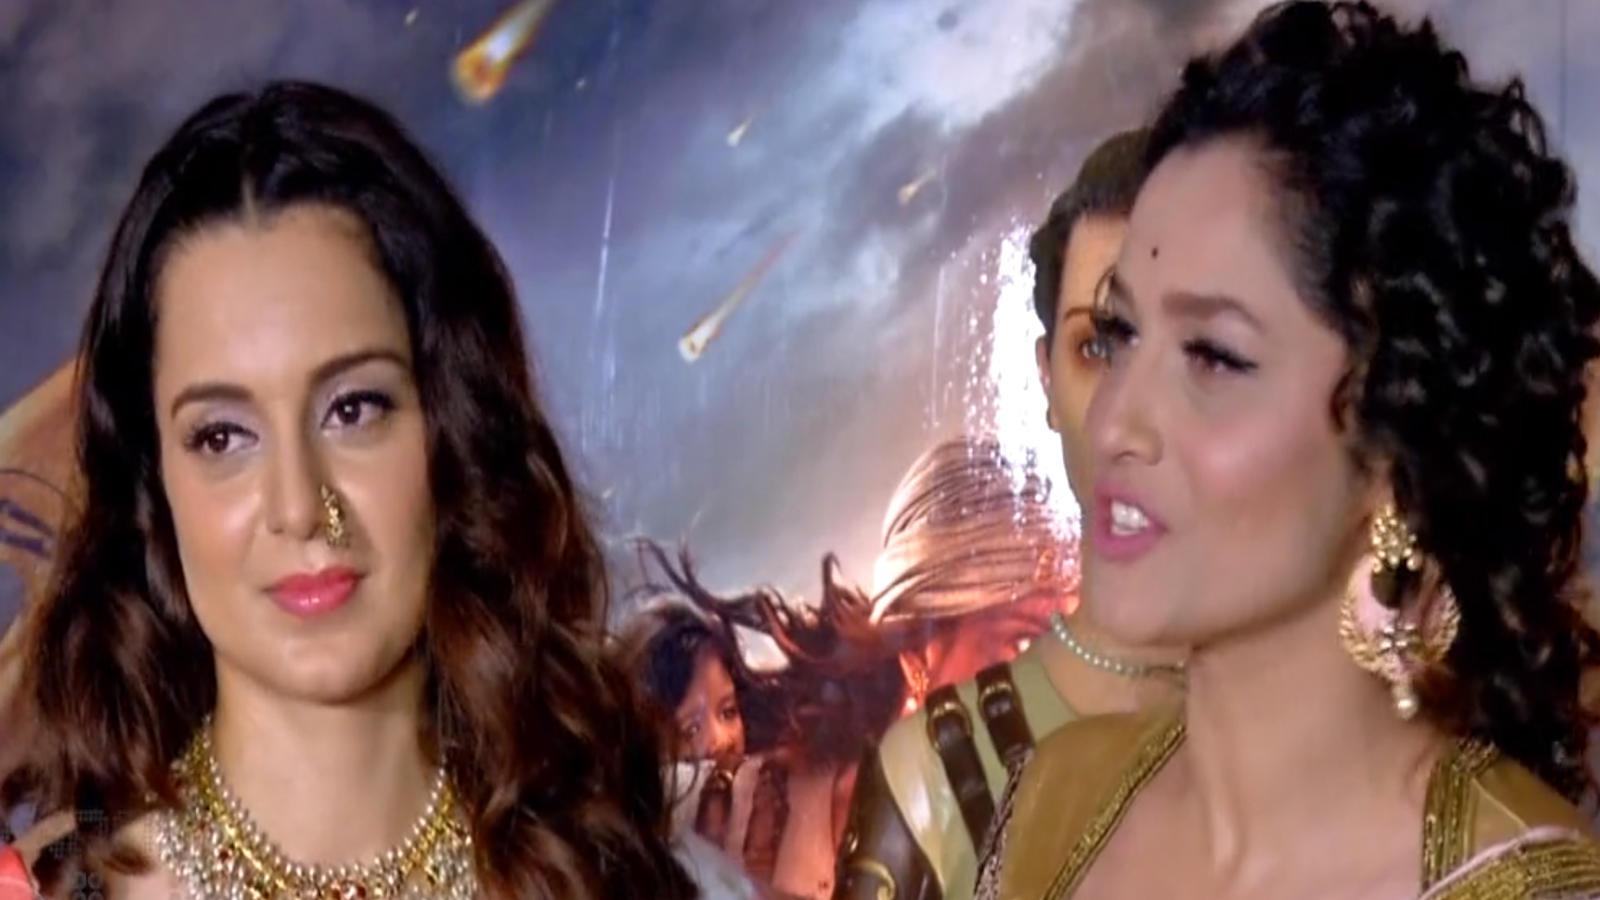 Ankita Lokhande deserved a better debut than 'Manikarnika': Kangana Ranaut